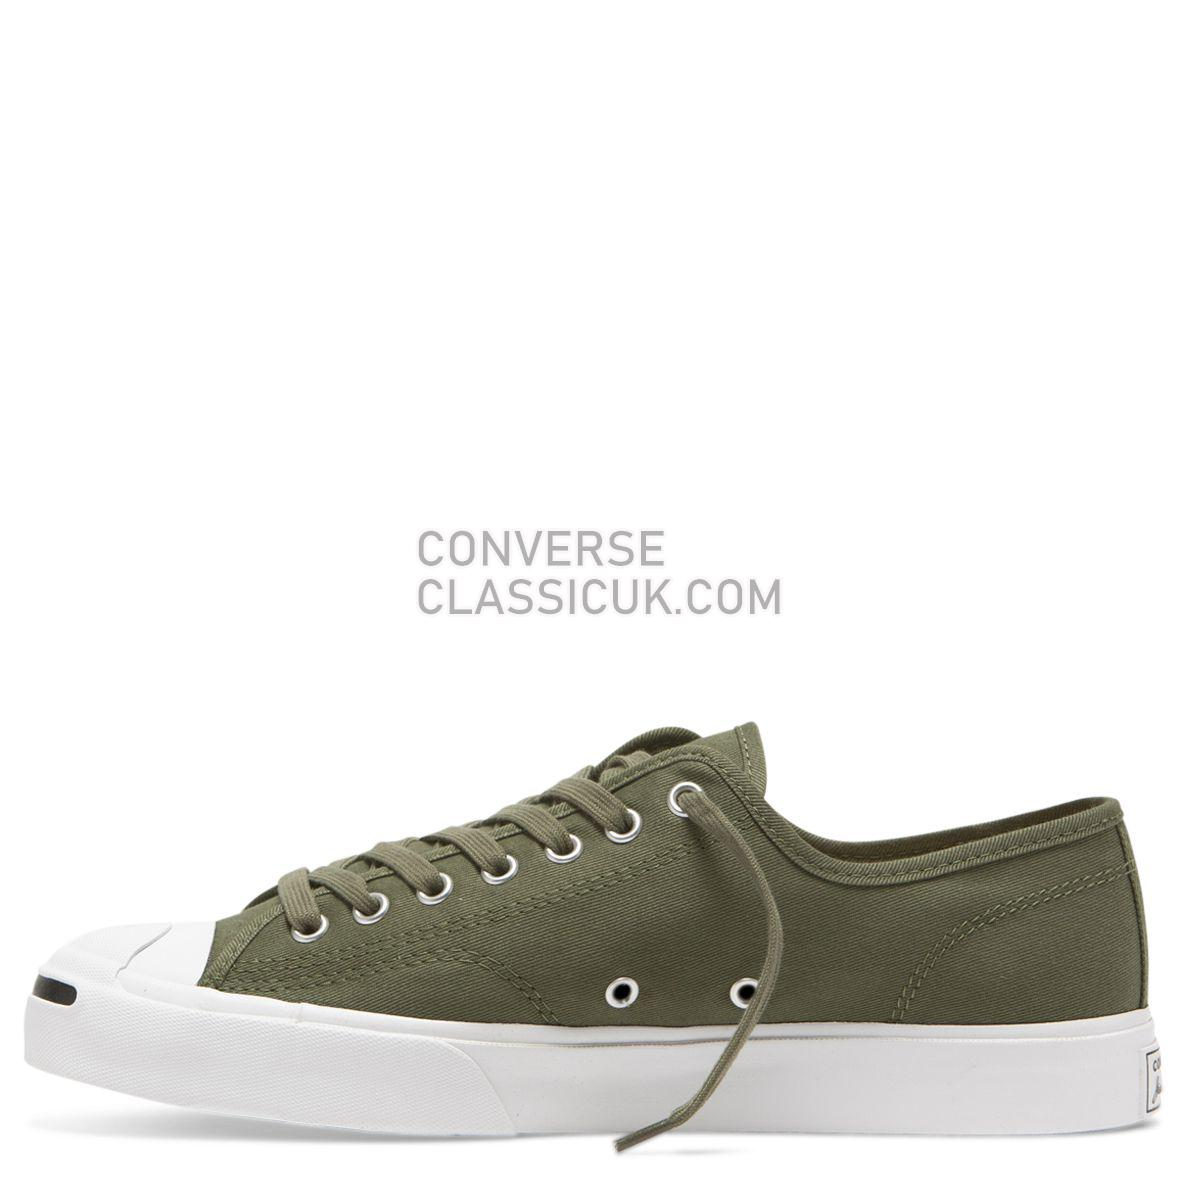 Converse Jack Purcell Twill Low Top Field Surplus Mens 164105 Field Surplus/White/Black Shoes